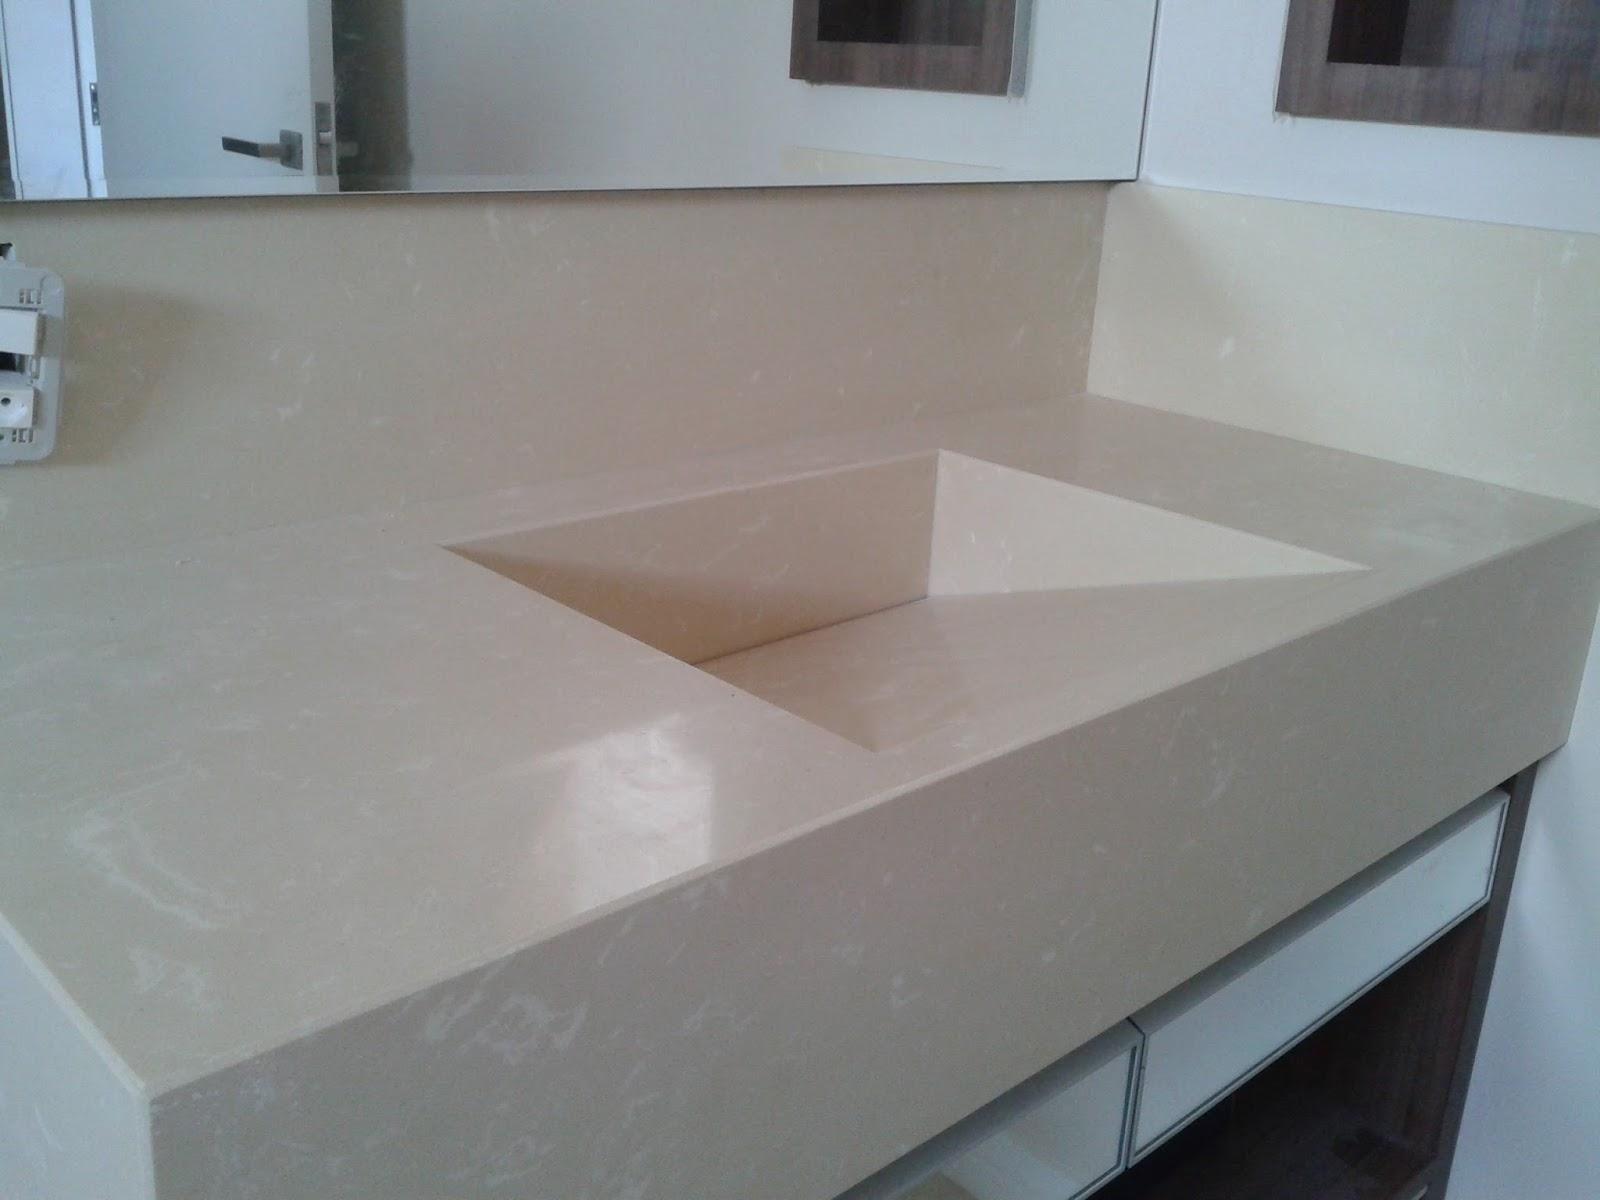 bá da Bia: banheiros granitos e armários #546977 1600x1200 Armario Banheiro Granito